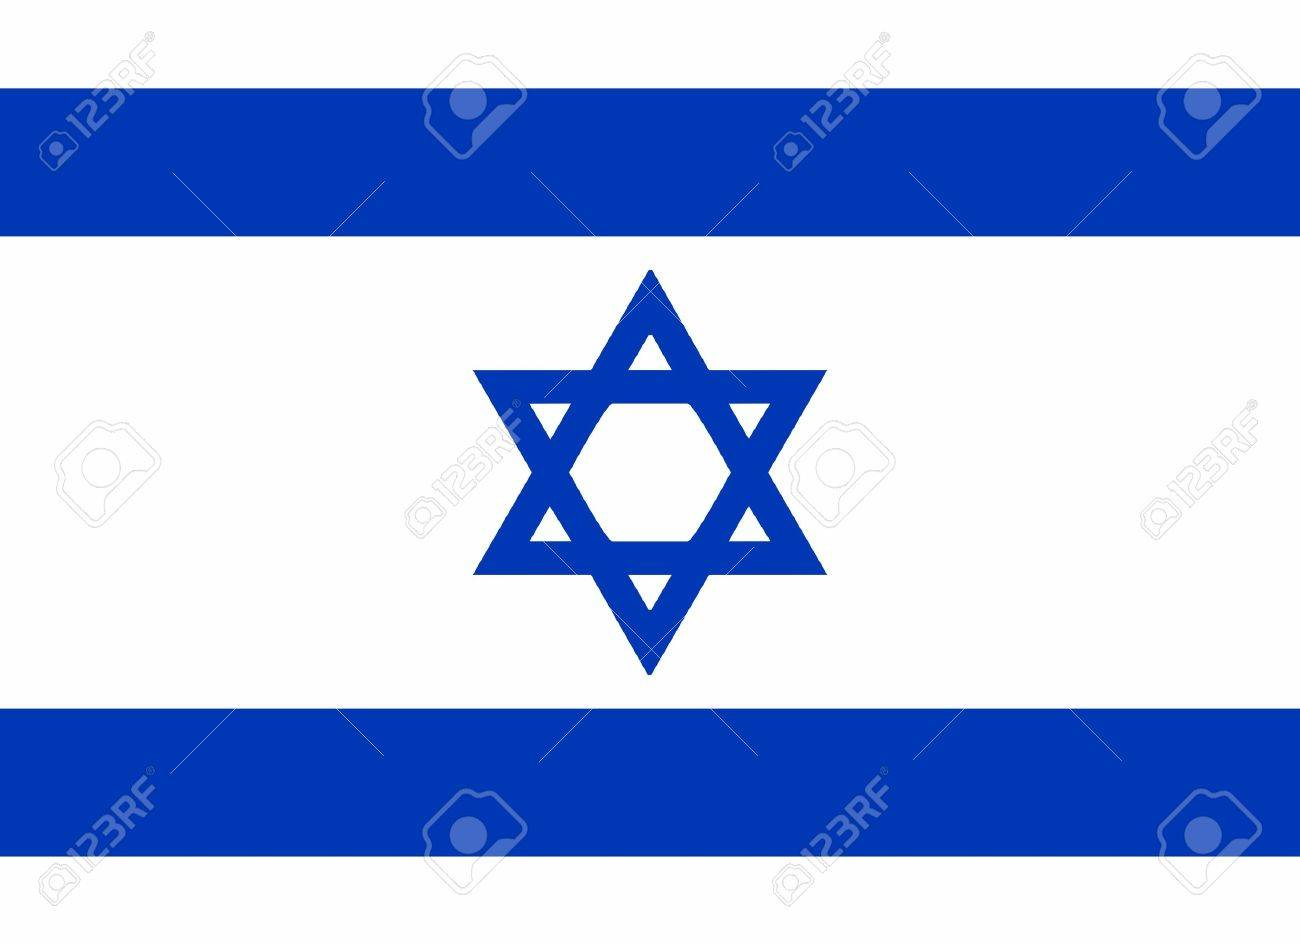 Native Speaker Hebräisch - Flagge